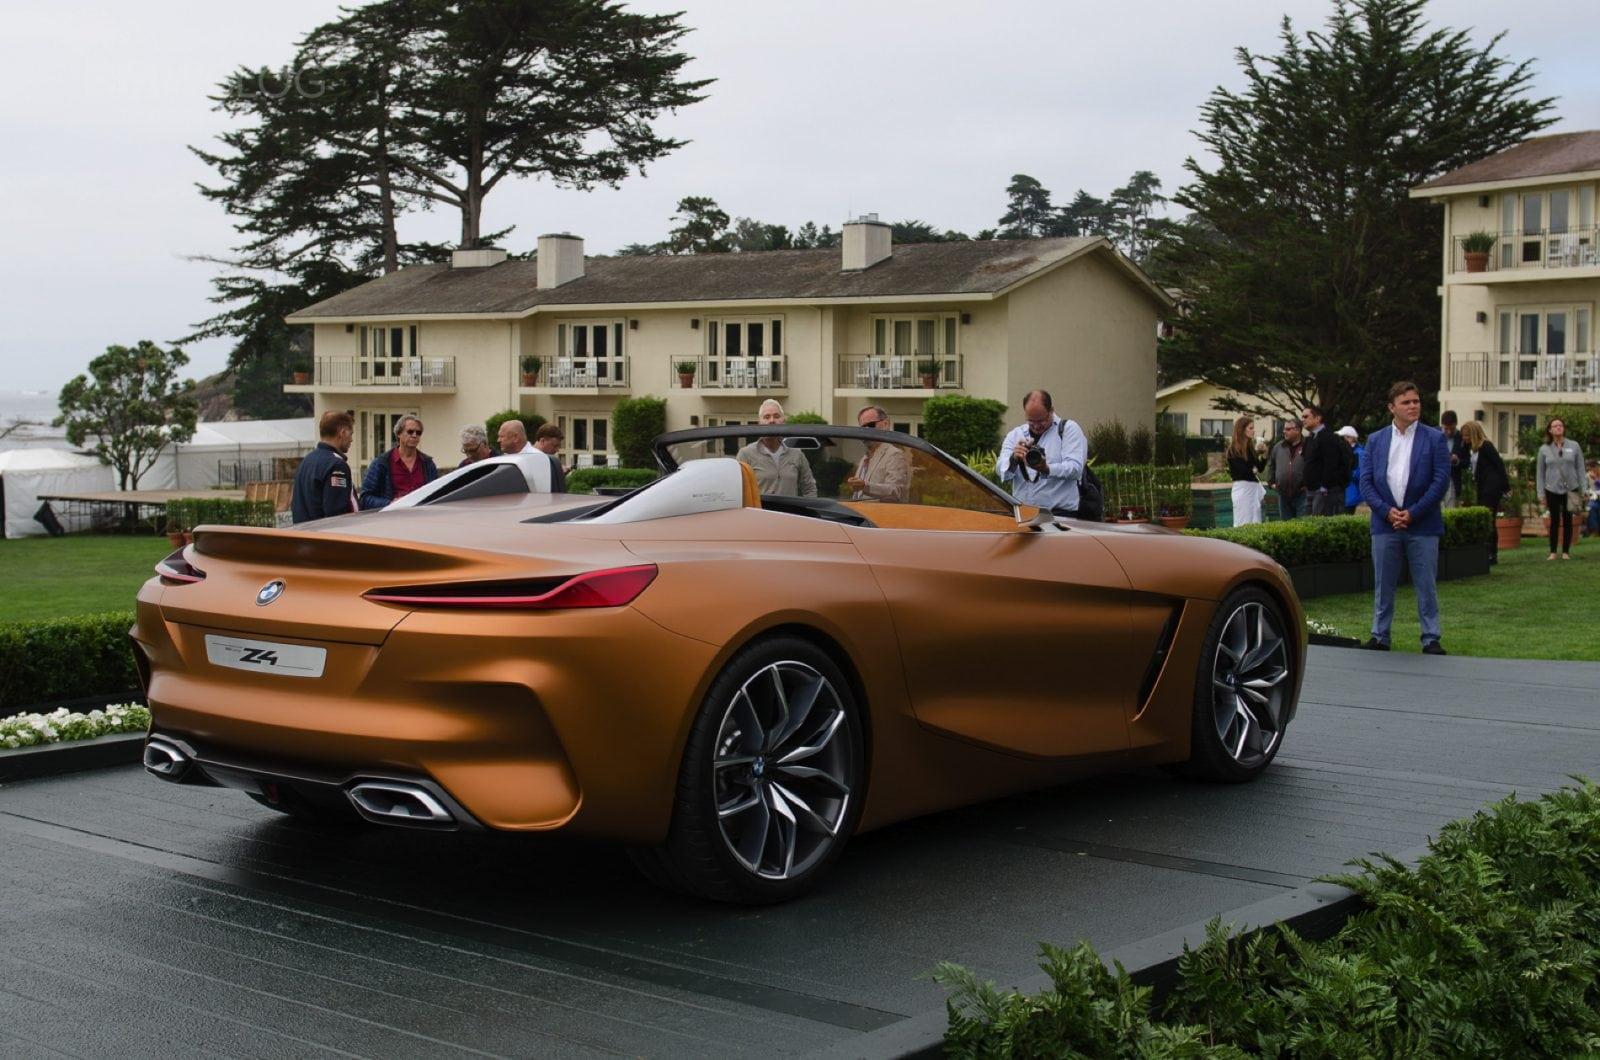 BMW Z4 Concept 2017 Design Live Photos from Pebble Beach